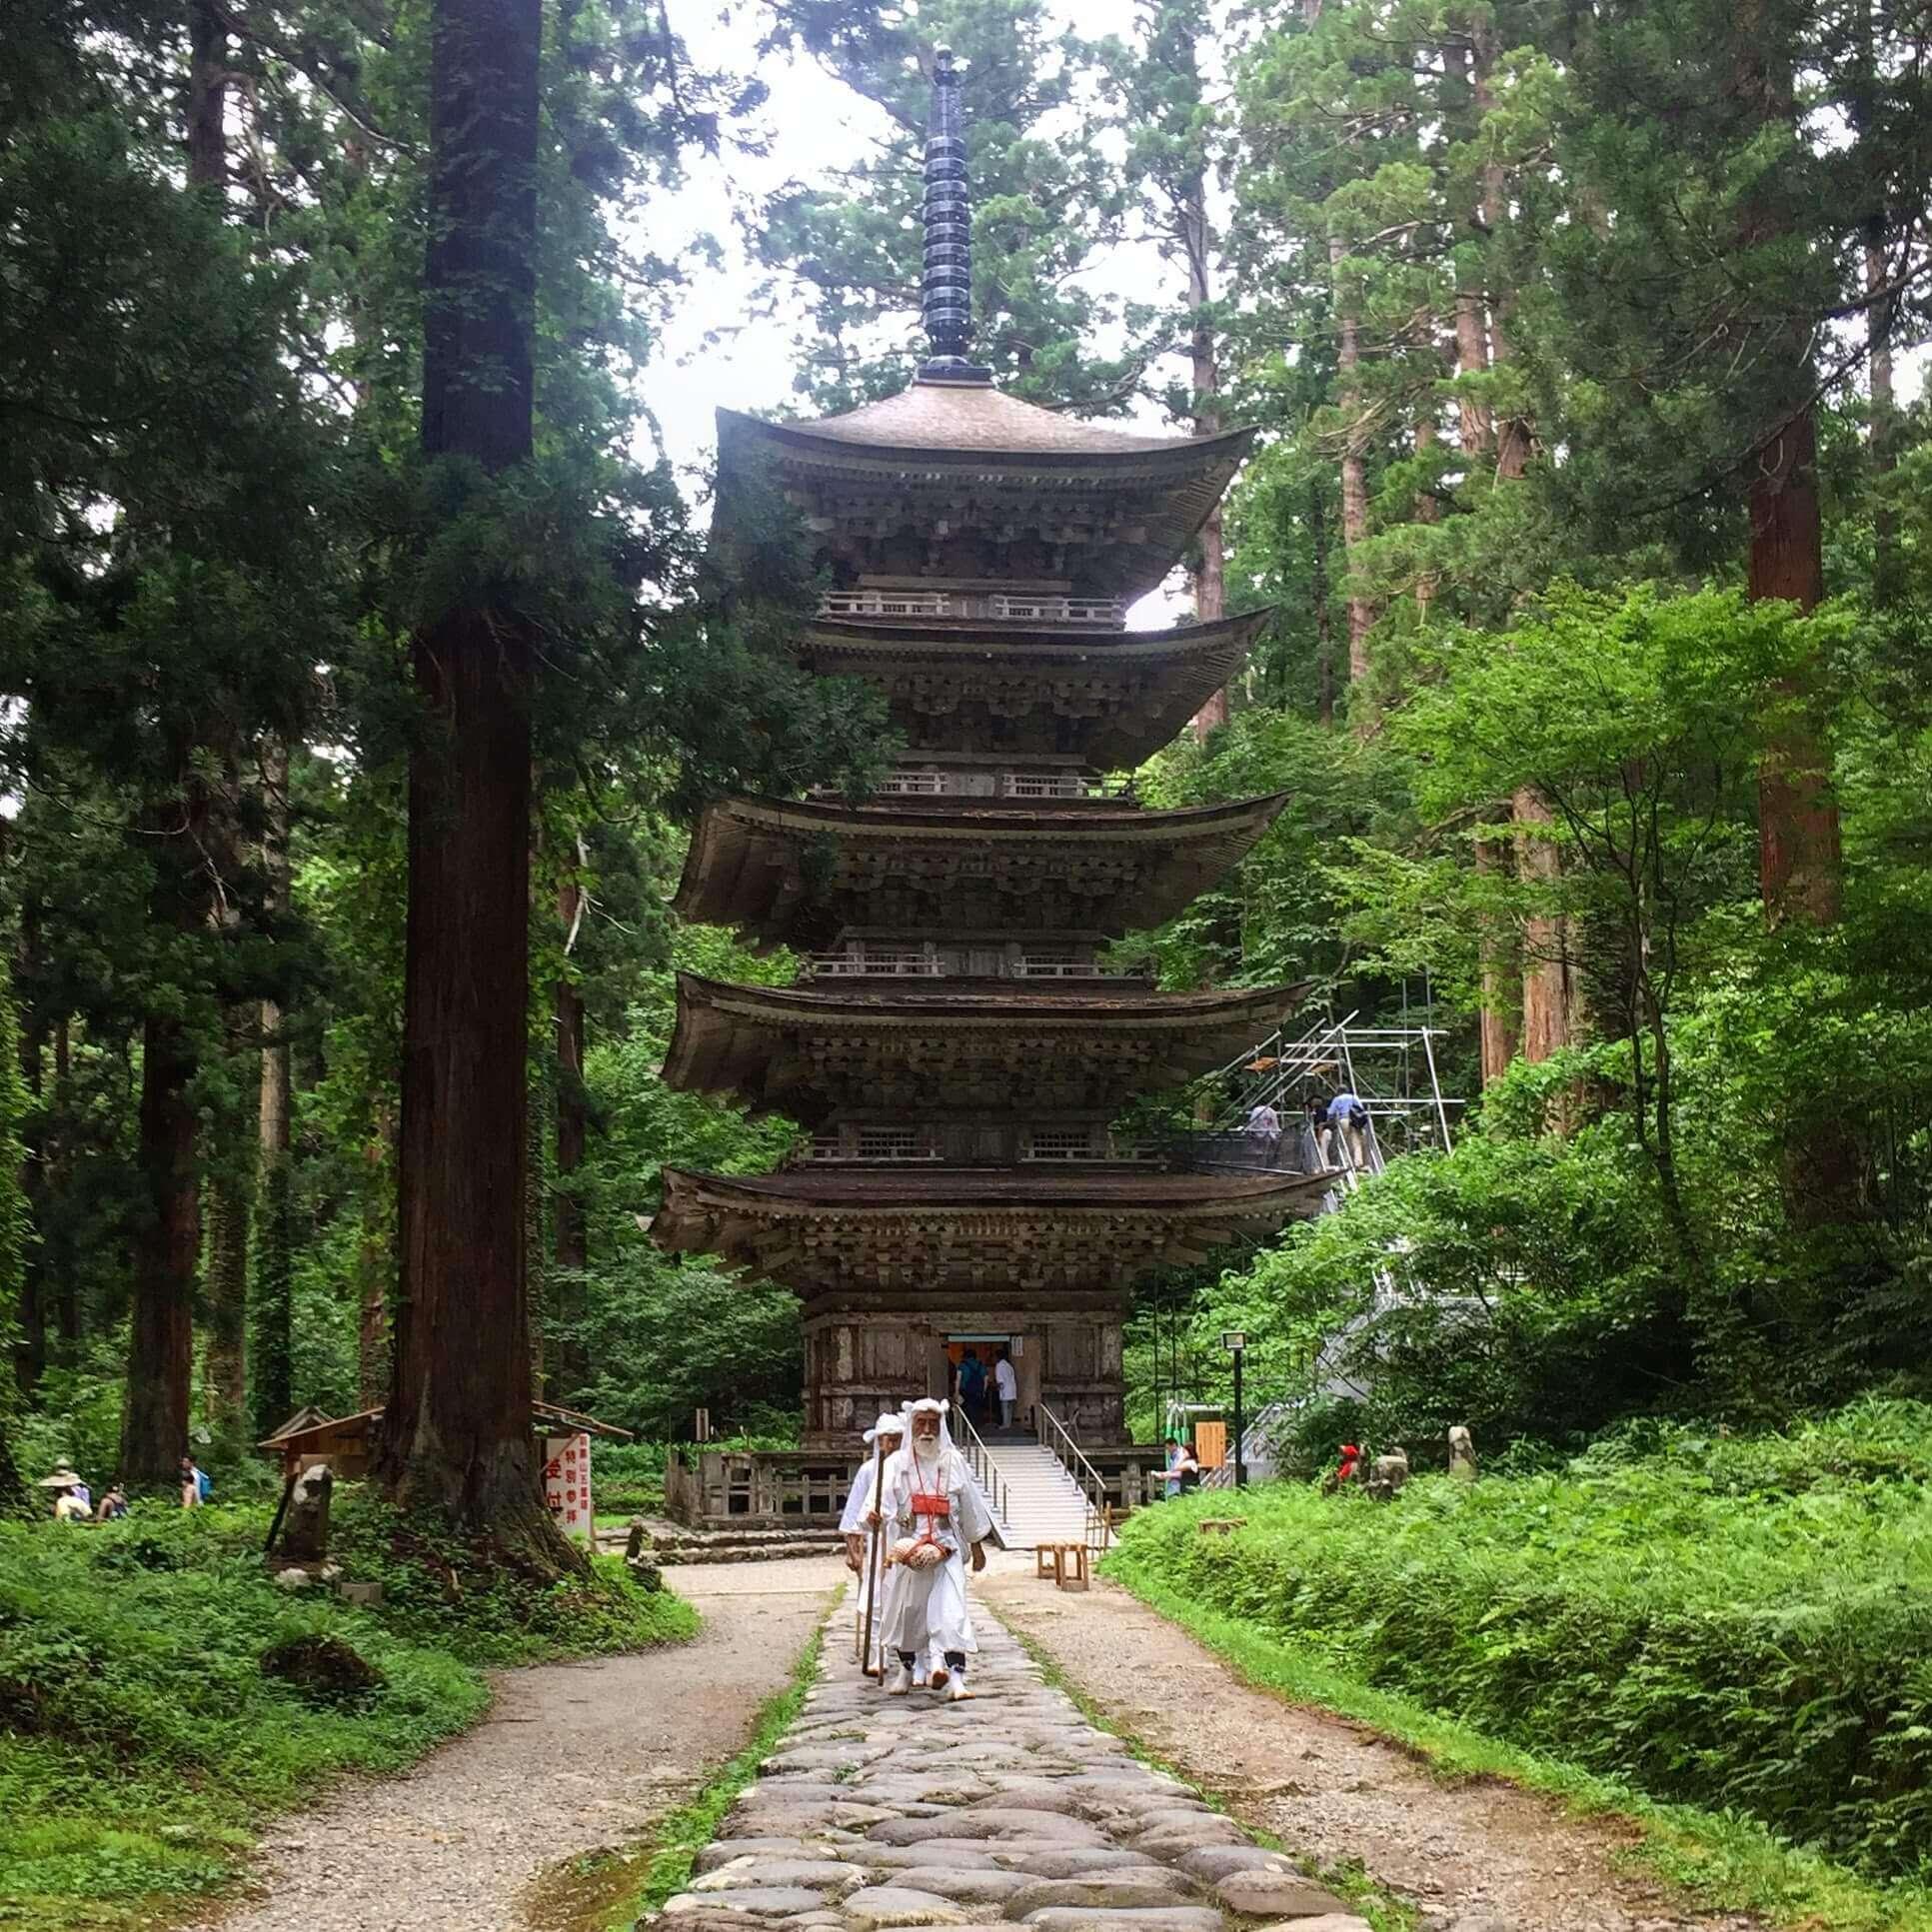 Yamabushi training near the Five Story Pagoda on Mt. Haguro of the Dewa Sanzan